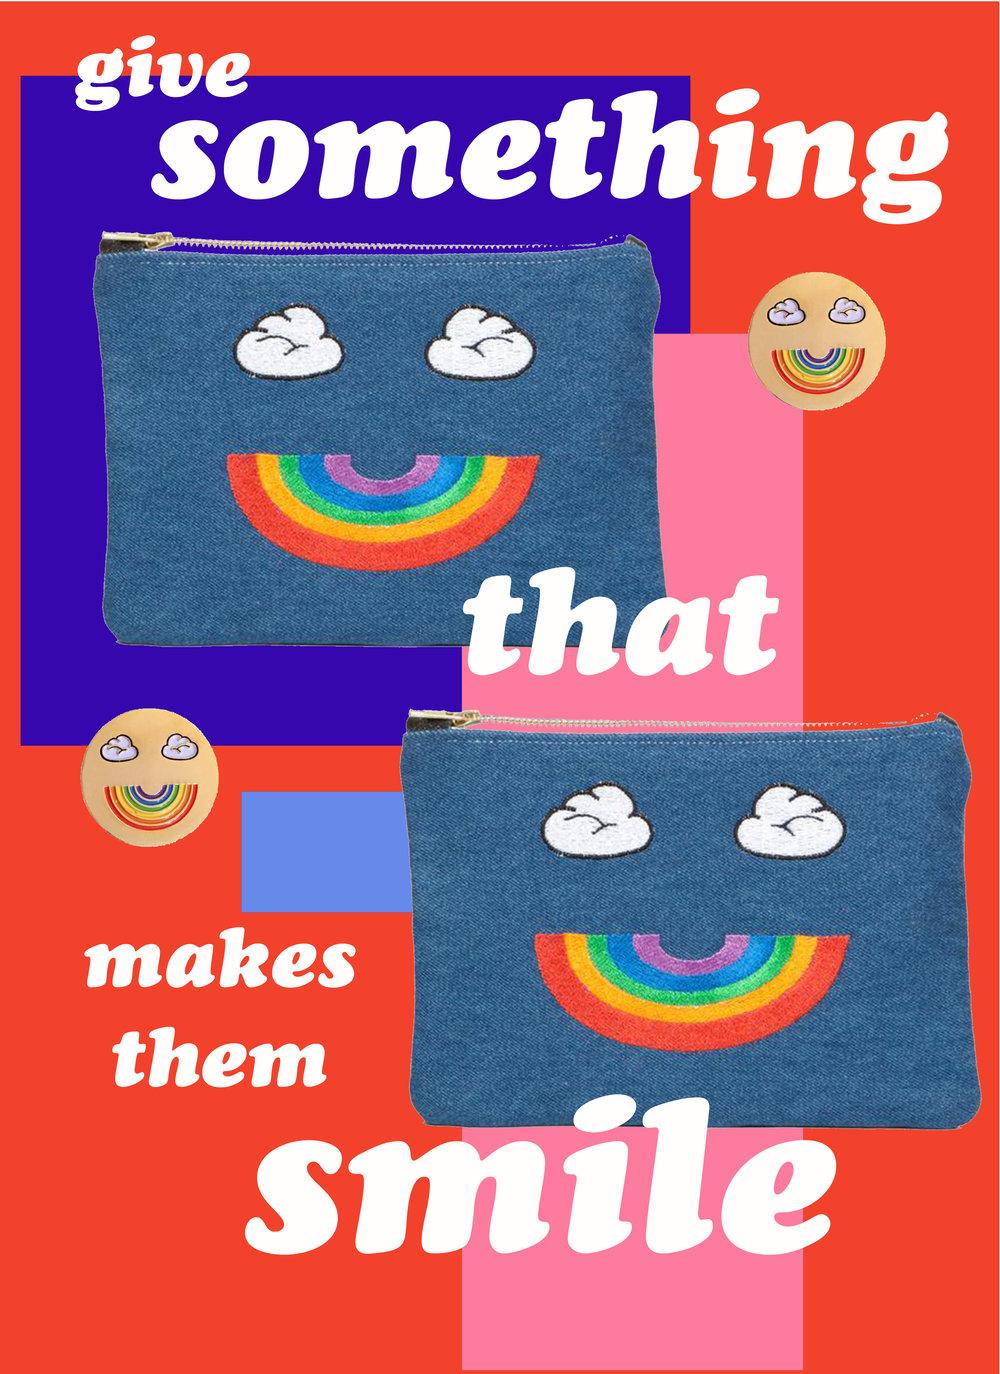 smilers_graphic.jpg